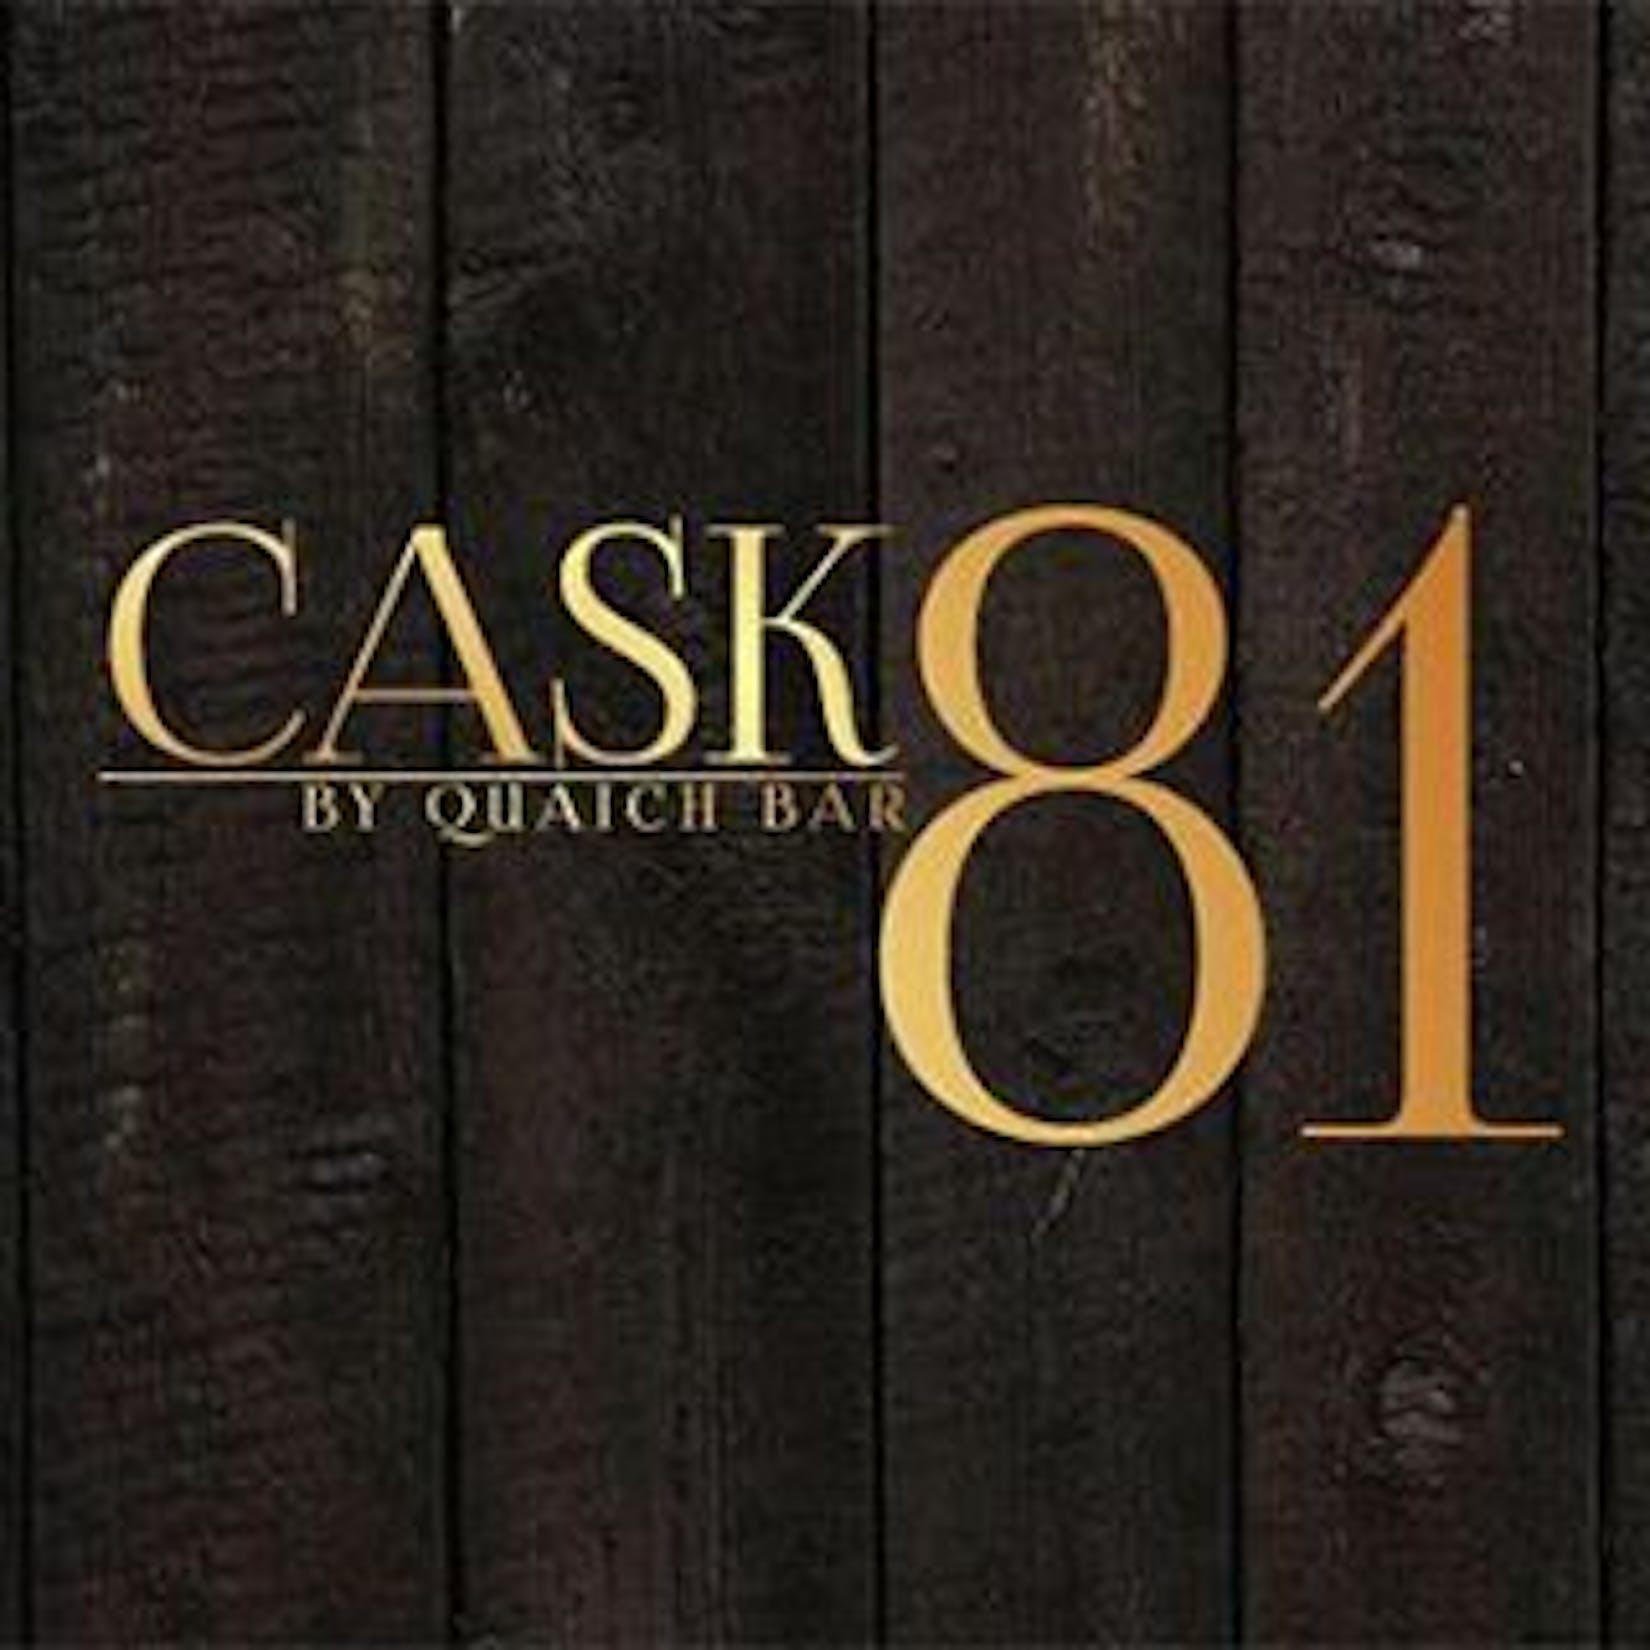 Cask 81 | yathar